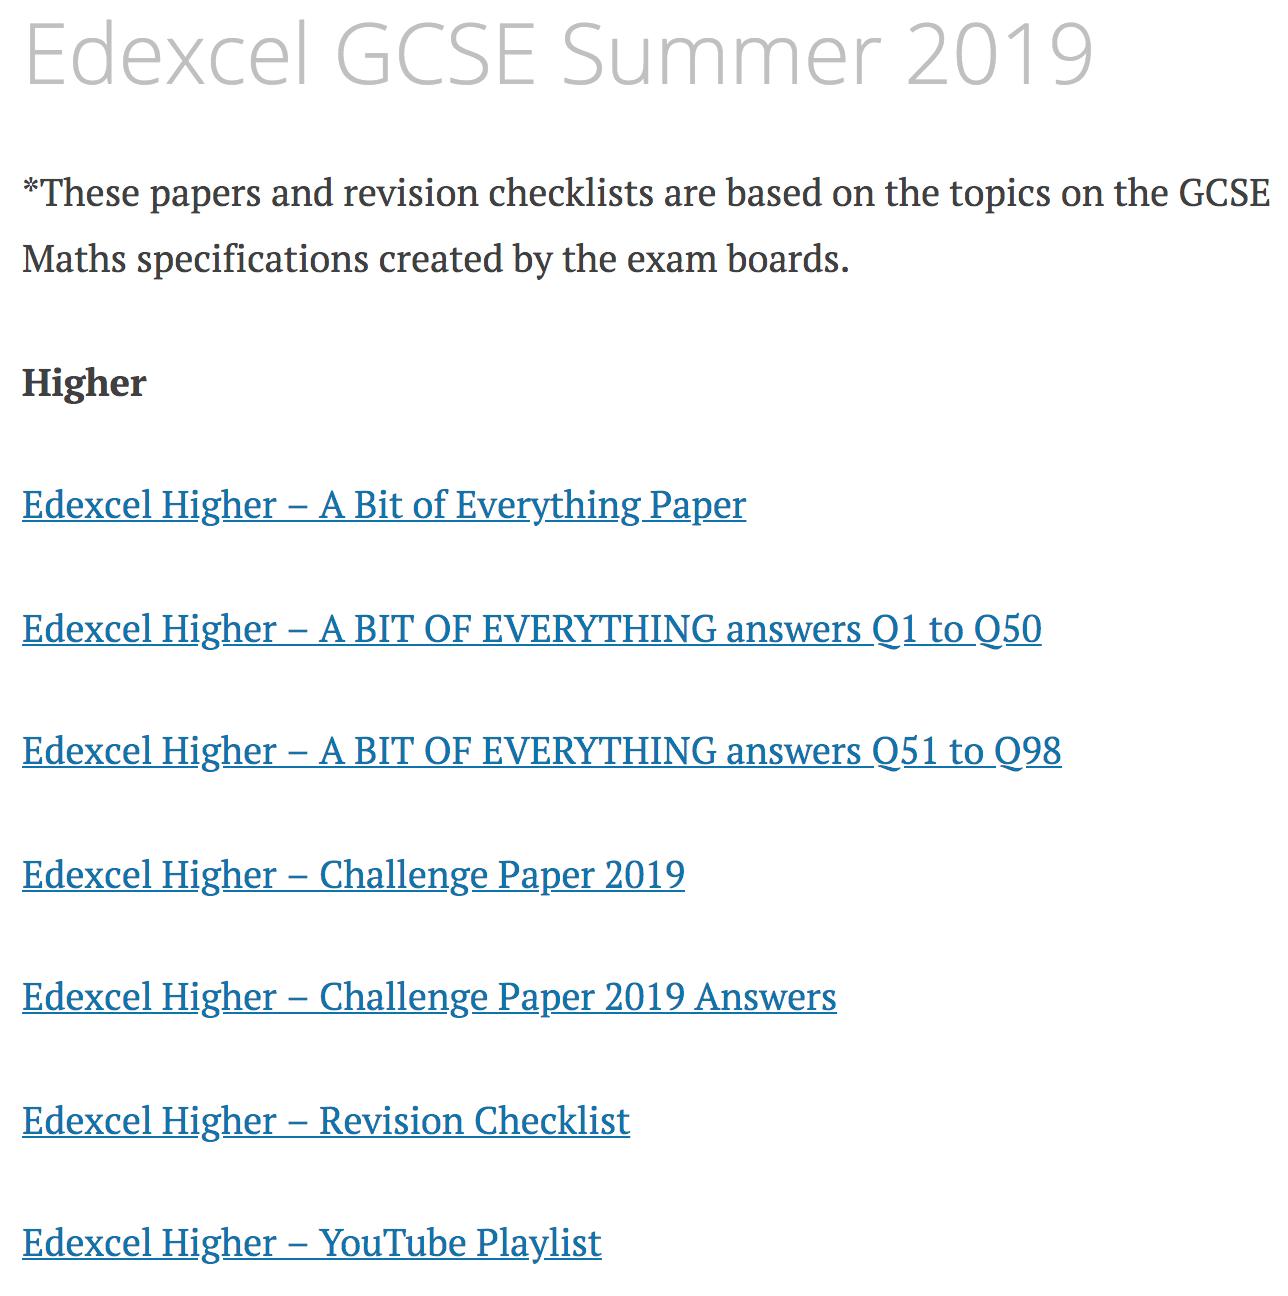 Edexcel GCSE Summer 2019 – Corbettmaths